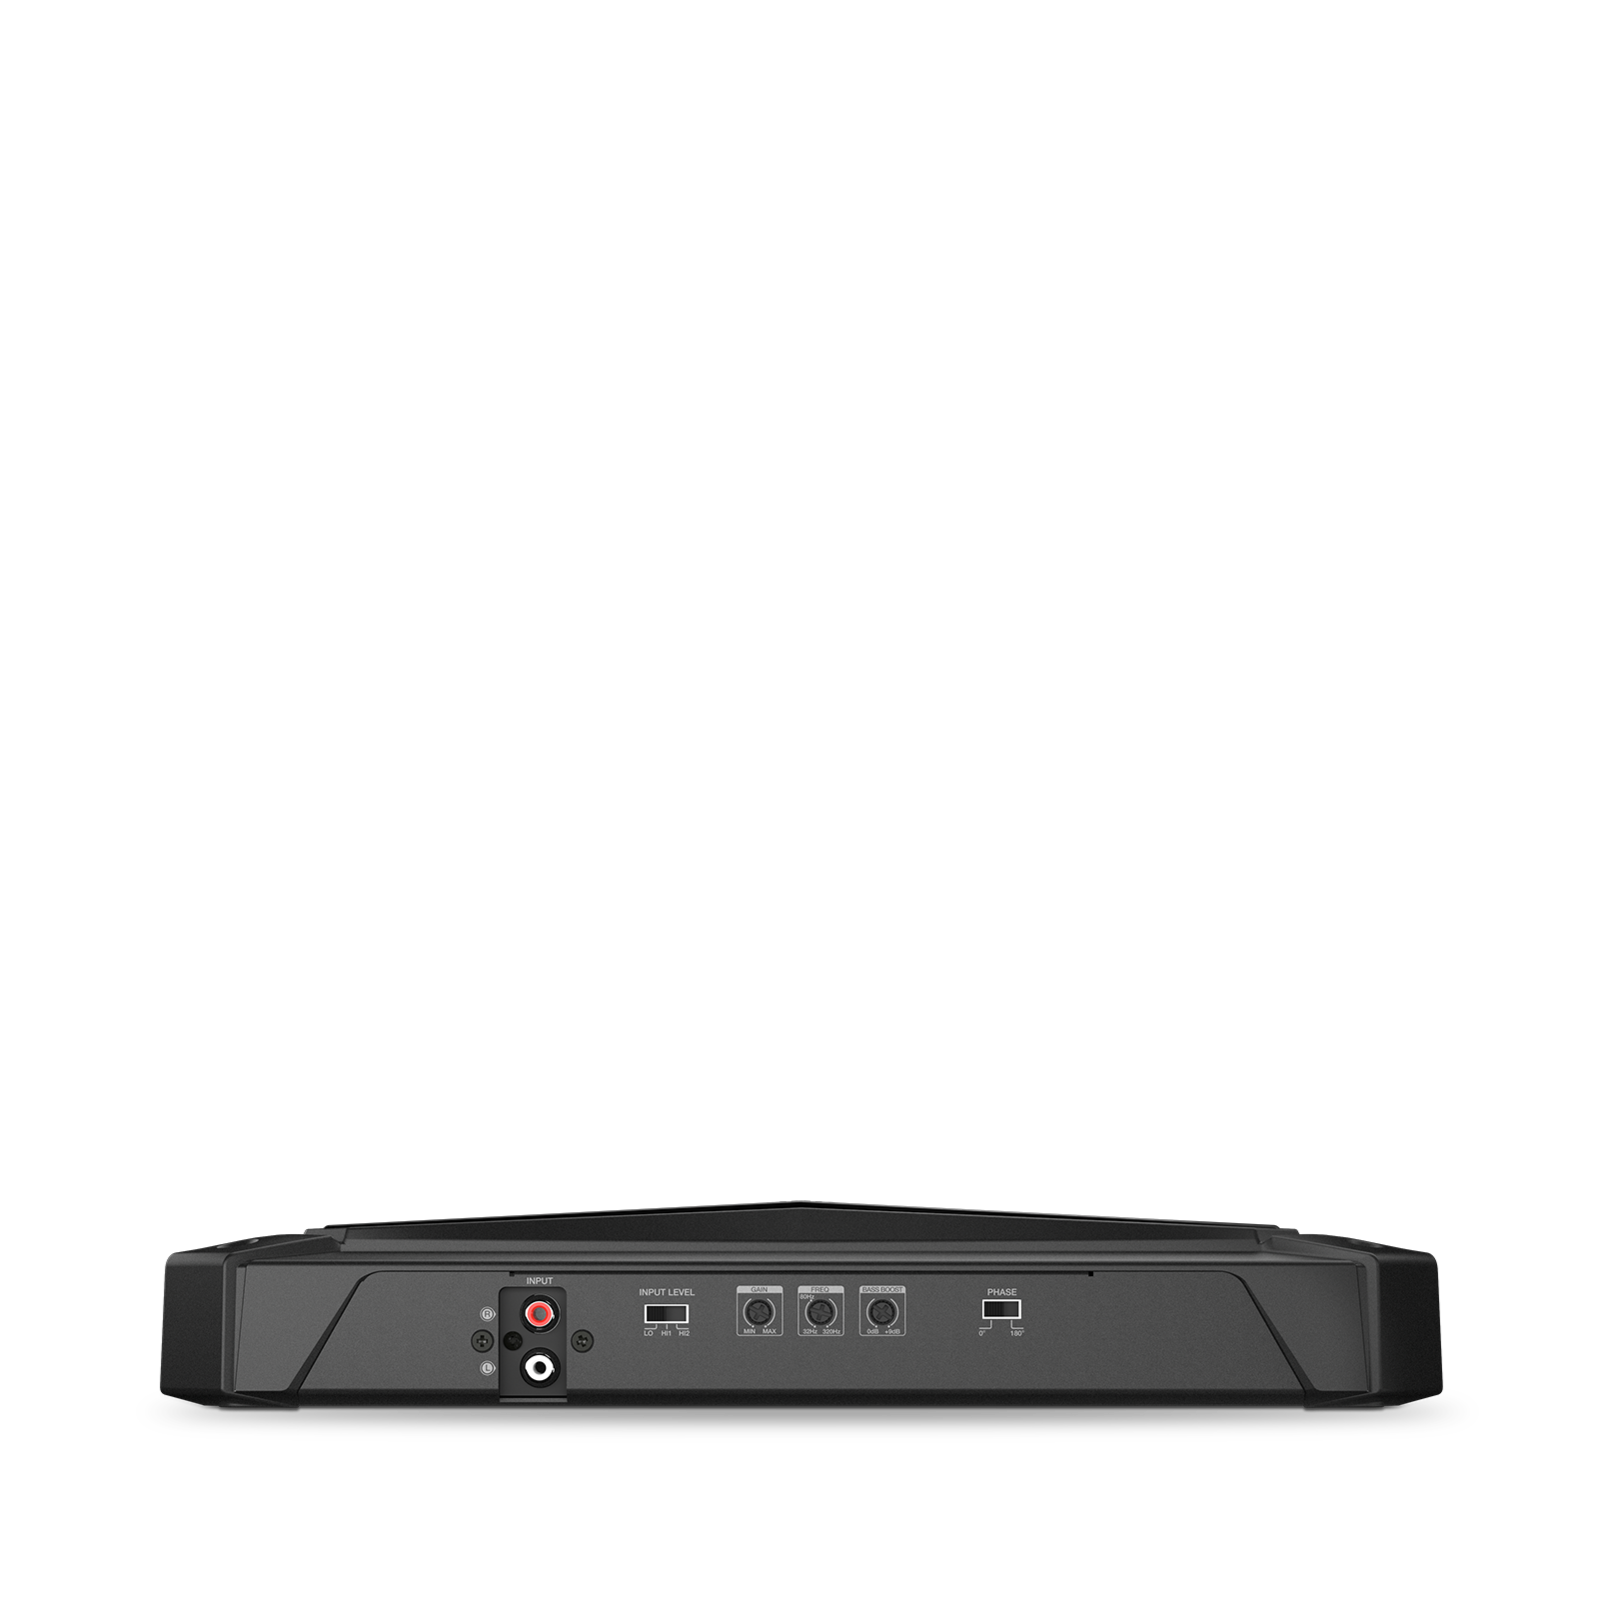 GTR-1001 - Black - Mono Channel, 2600W High Performance Subwoofer Amplifier - Detailshot 2